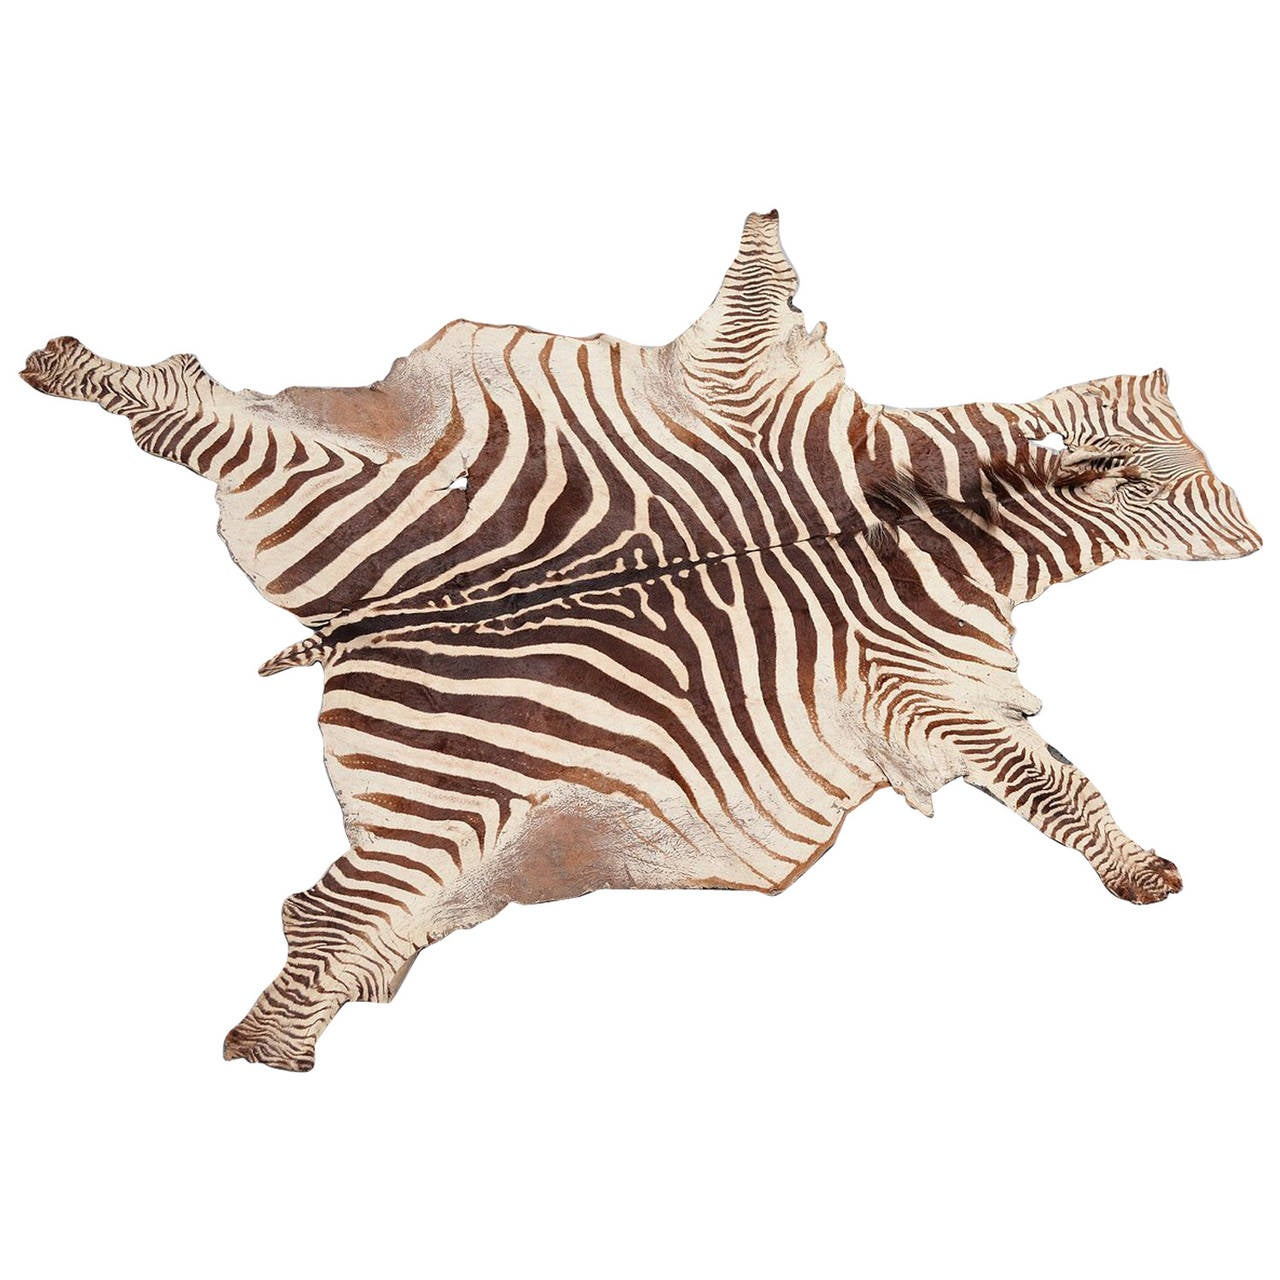 Zebra Sculpture Area Rug: Zebra Hide Trophy Rug Tanzania 1950 At 1stdibs